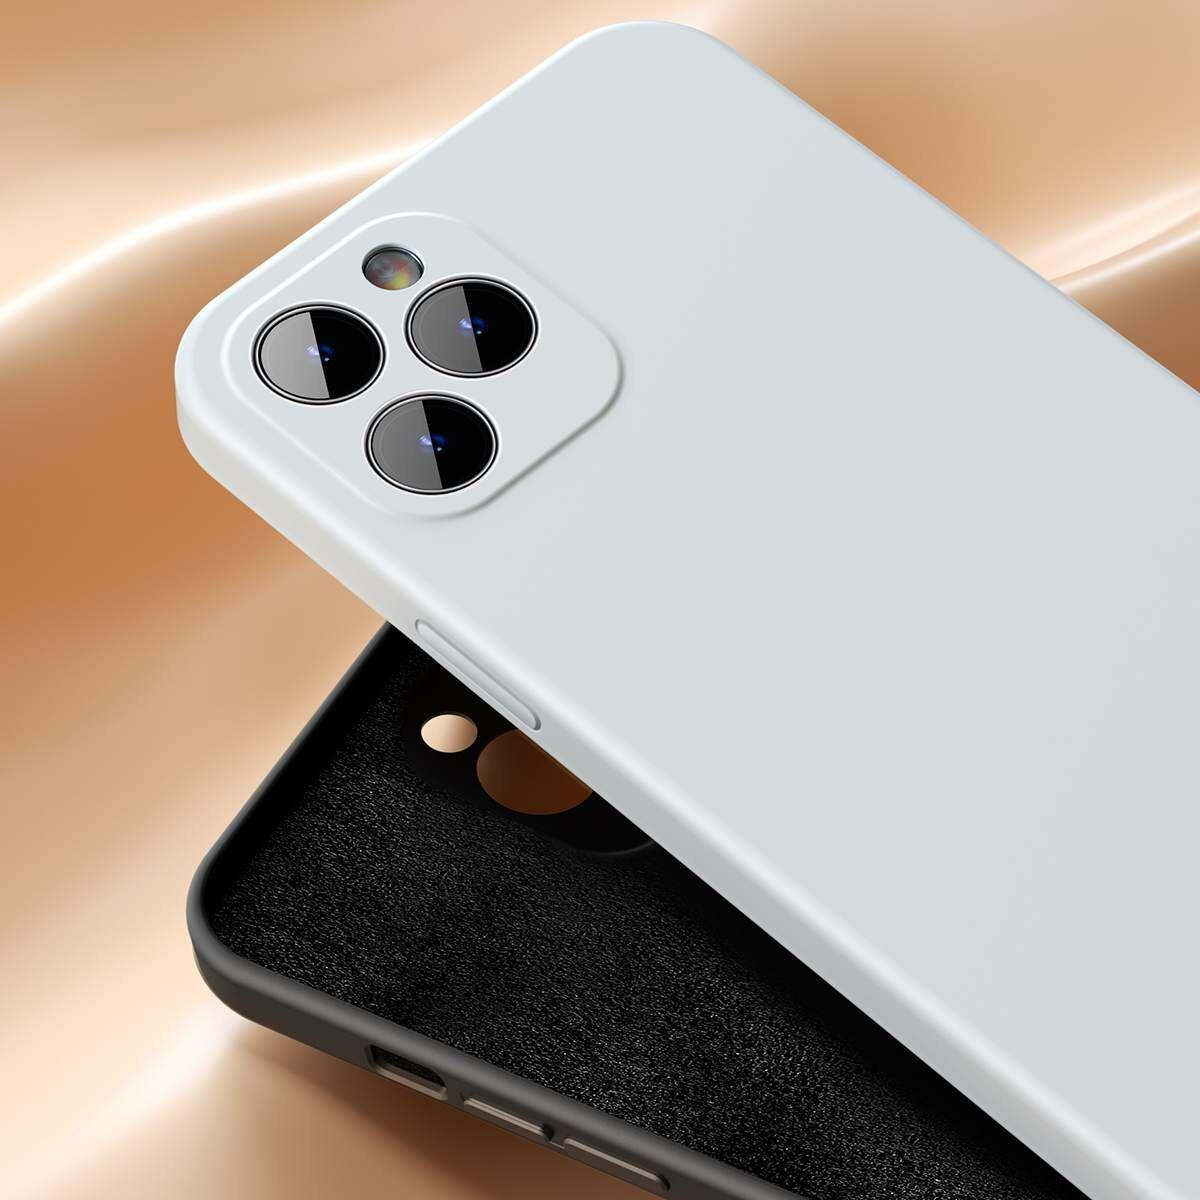 Baseus iPhone 12 mini tok, Liquid Sicila Gel, menta zöld (WIAPIPH54N-YT6B)